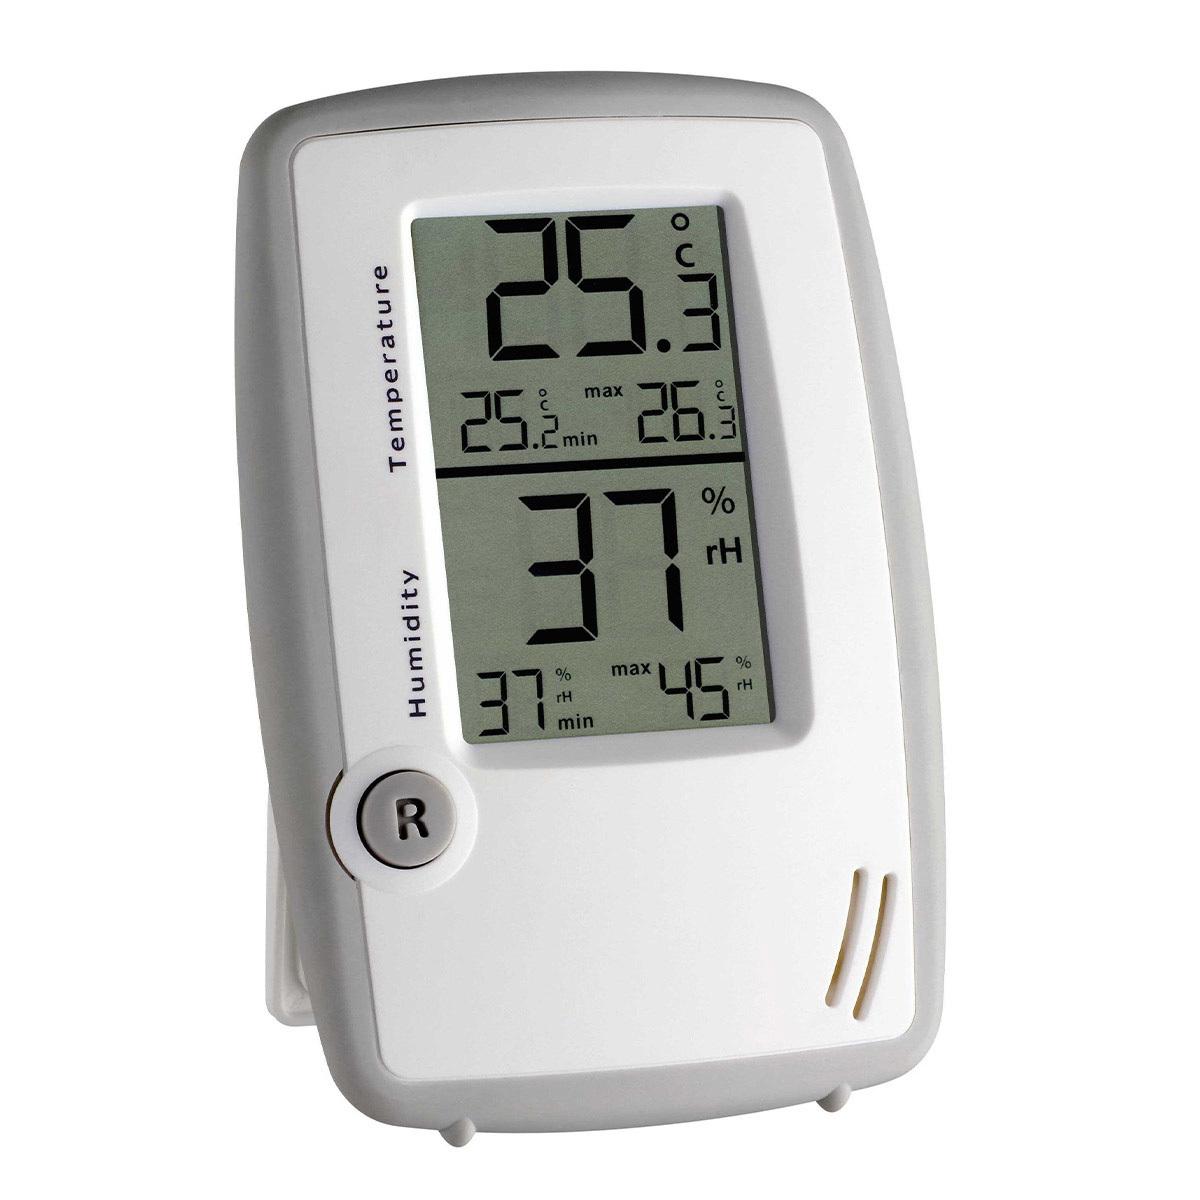 30-5015-digitales-thermo-hygrometer-1200x1200px.jpg